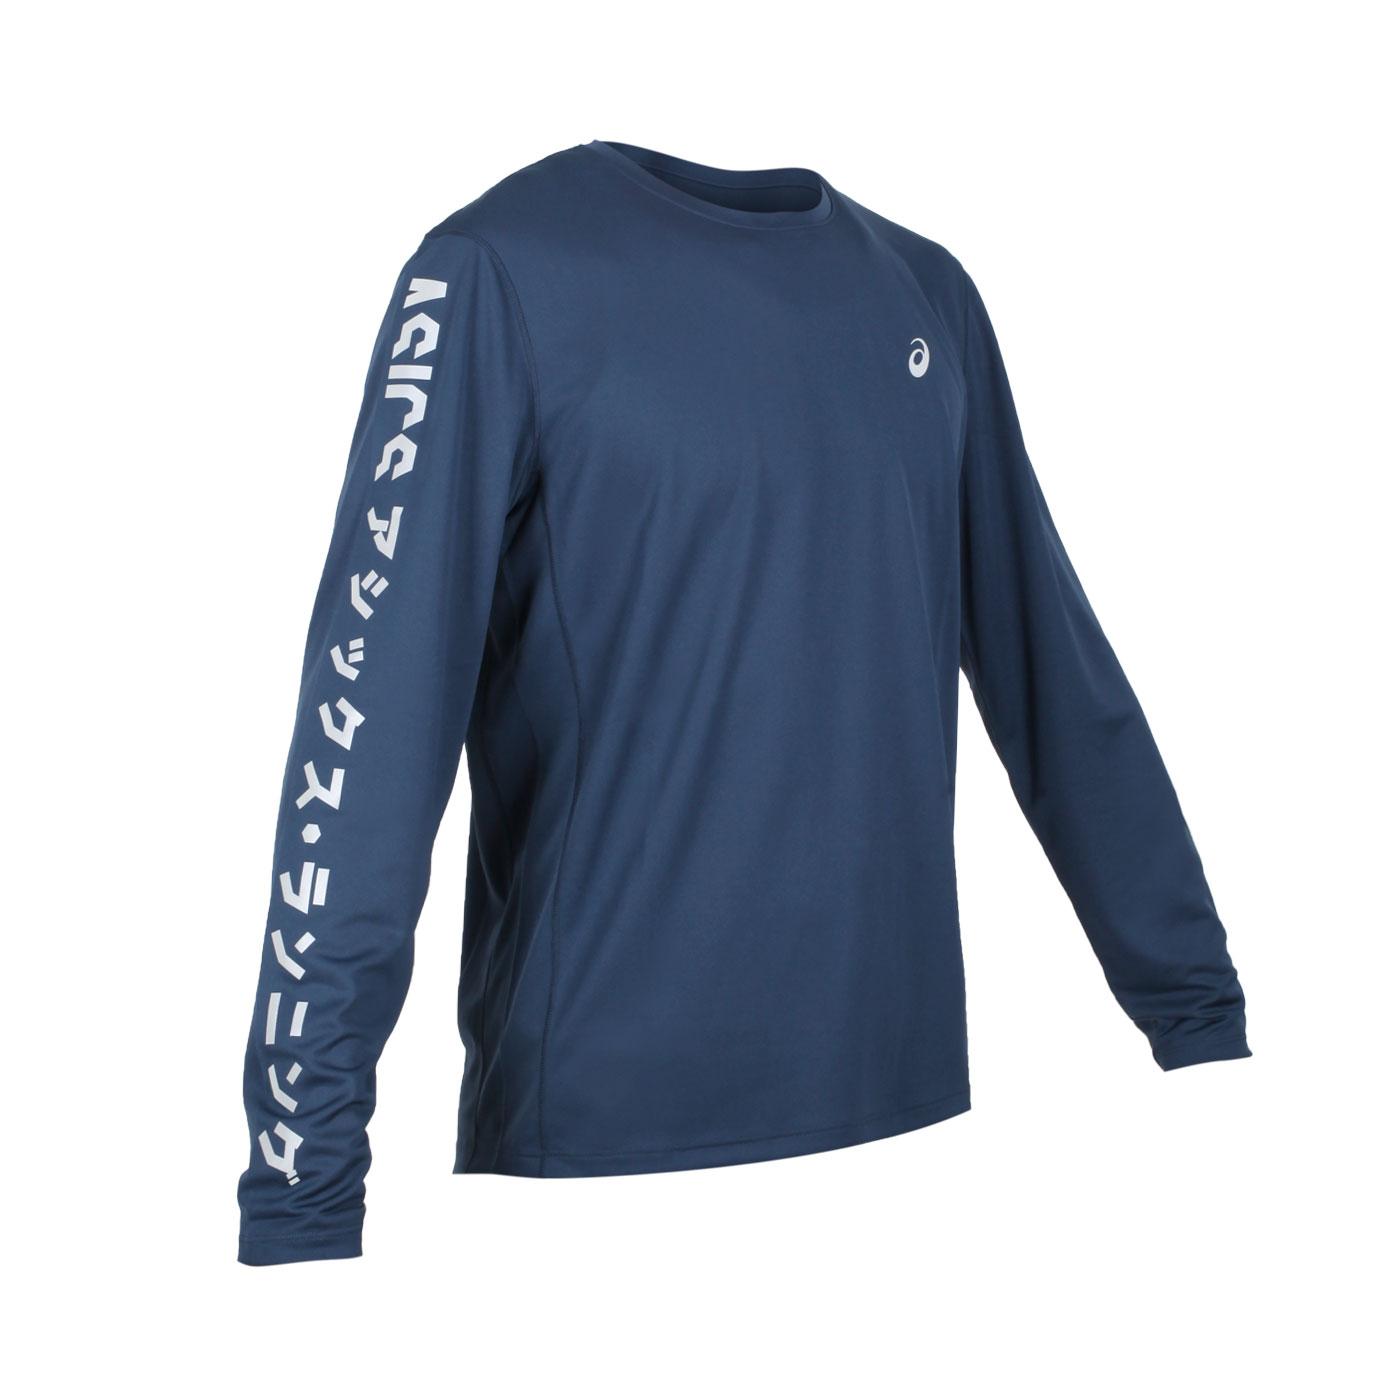 ASICS 男款長袖T恤 2011A818-407 - 深藍銀